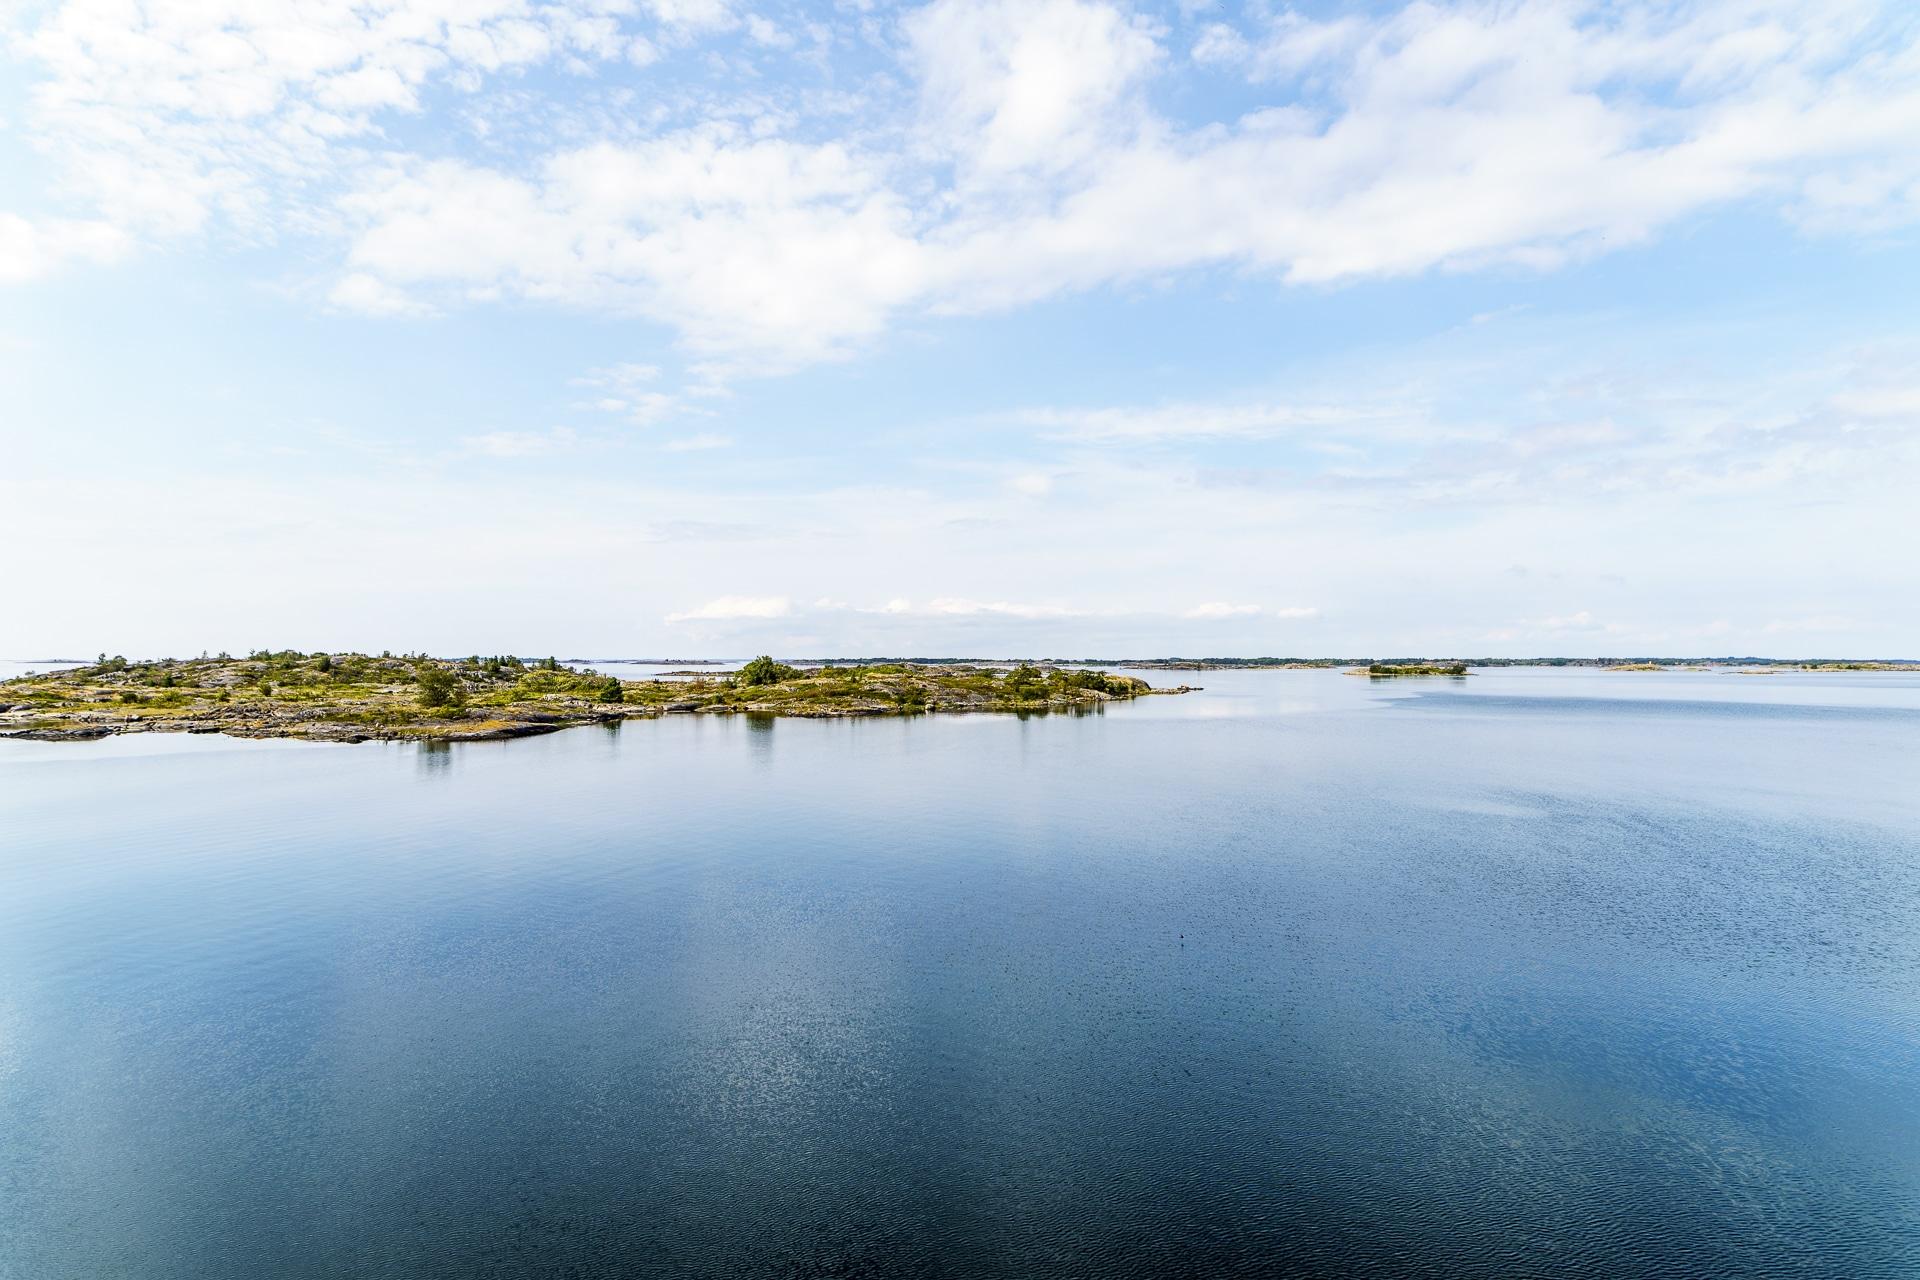 Finnisches Schärenmeer